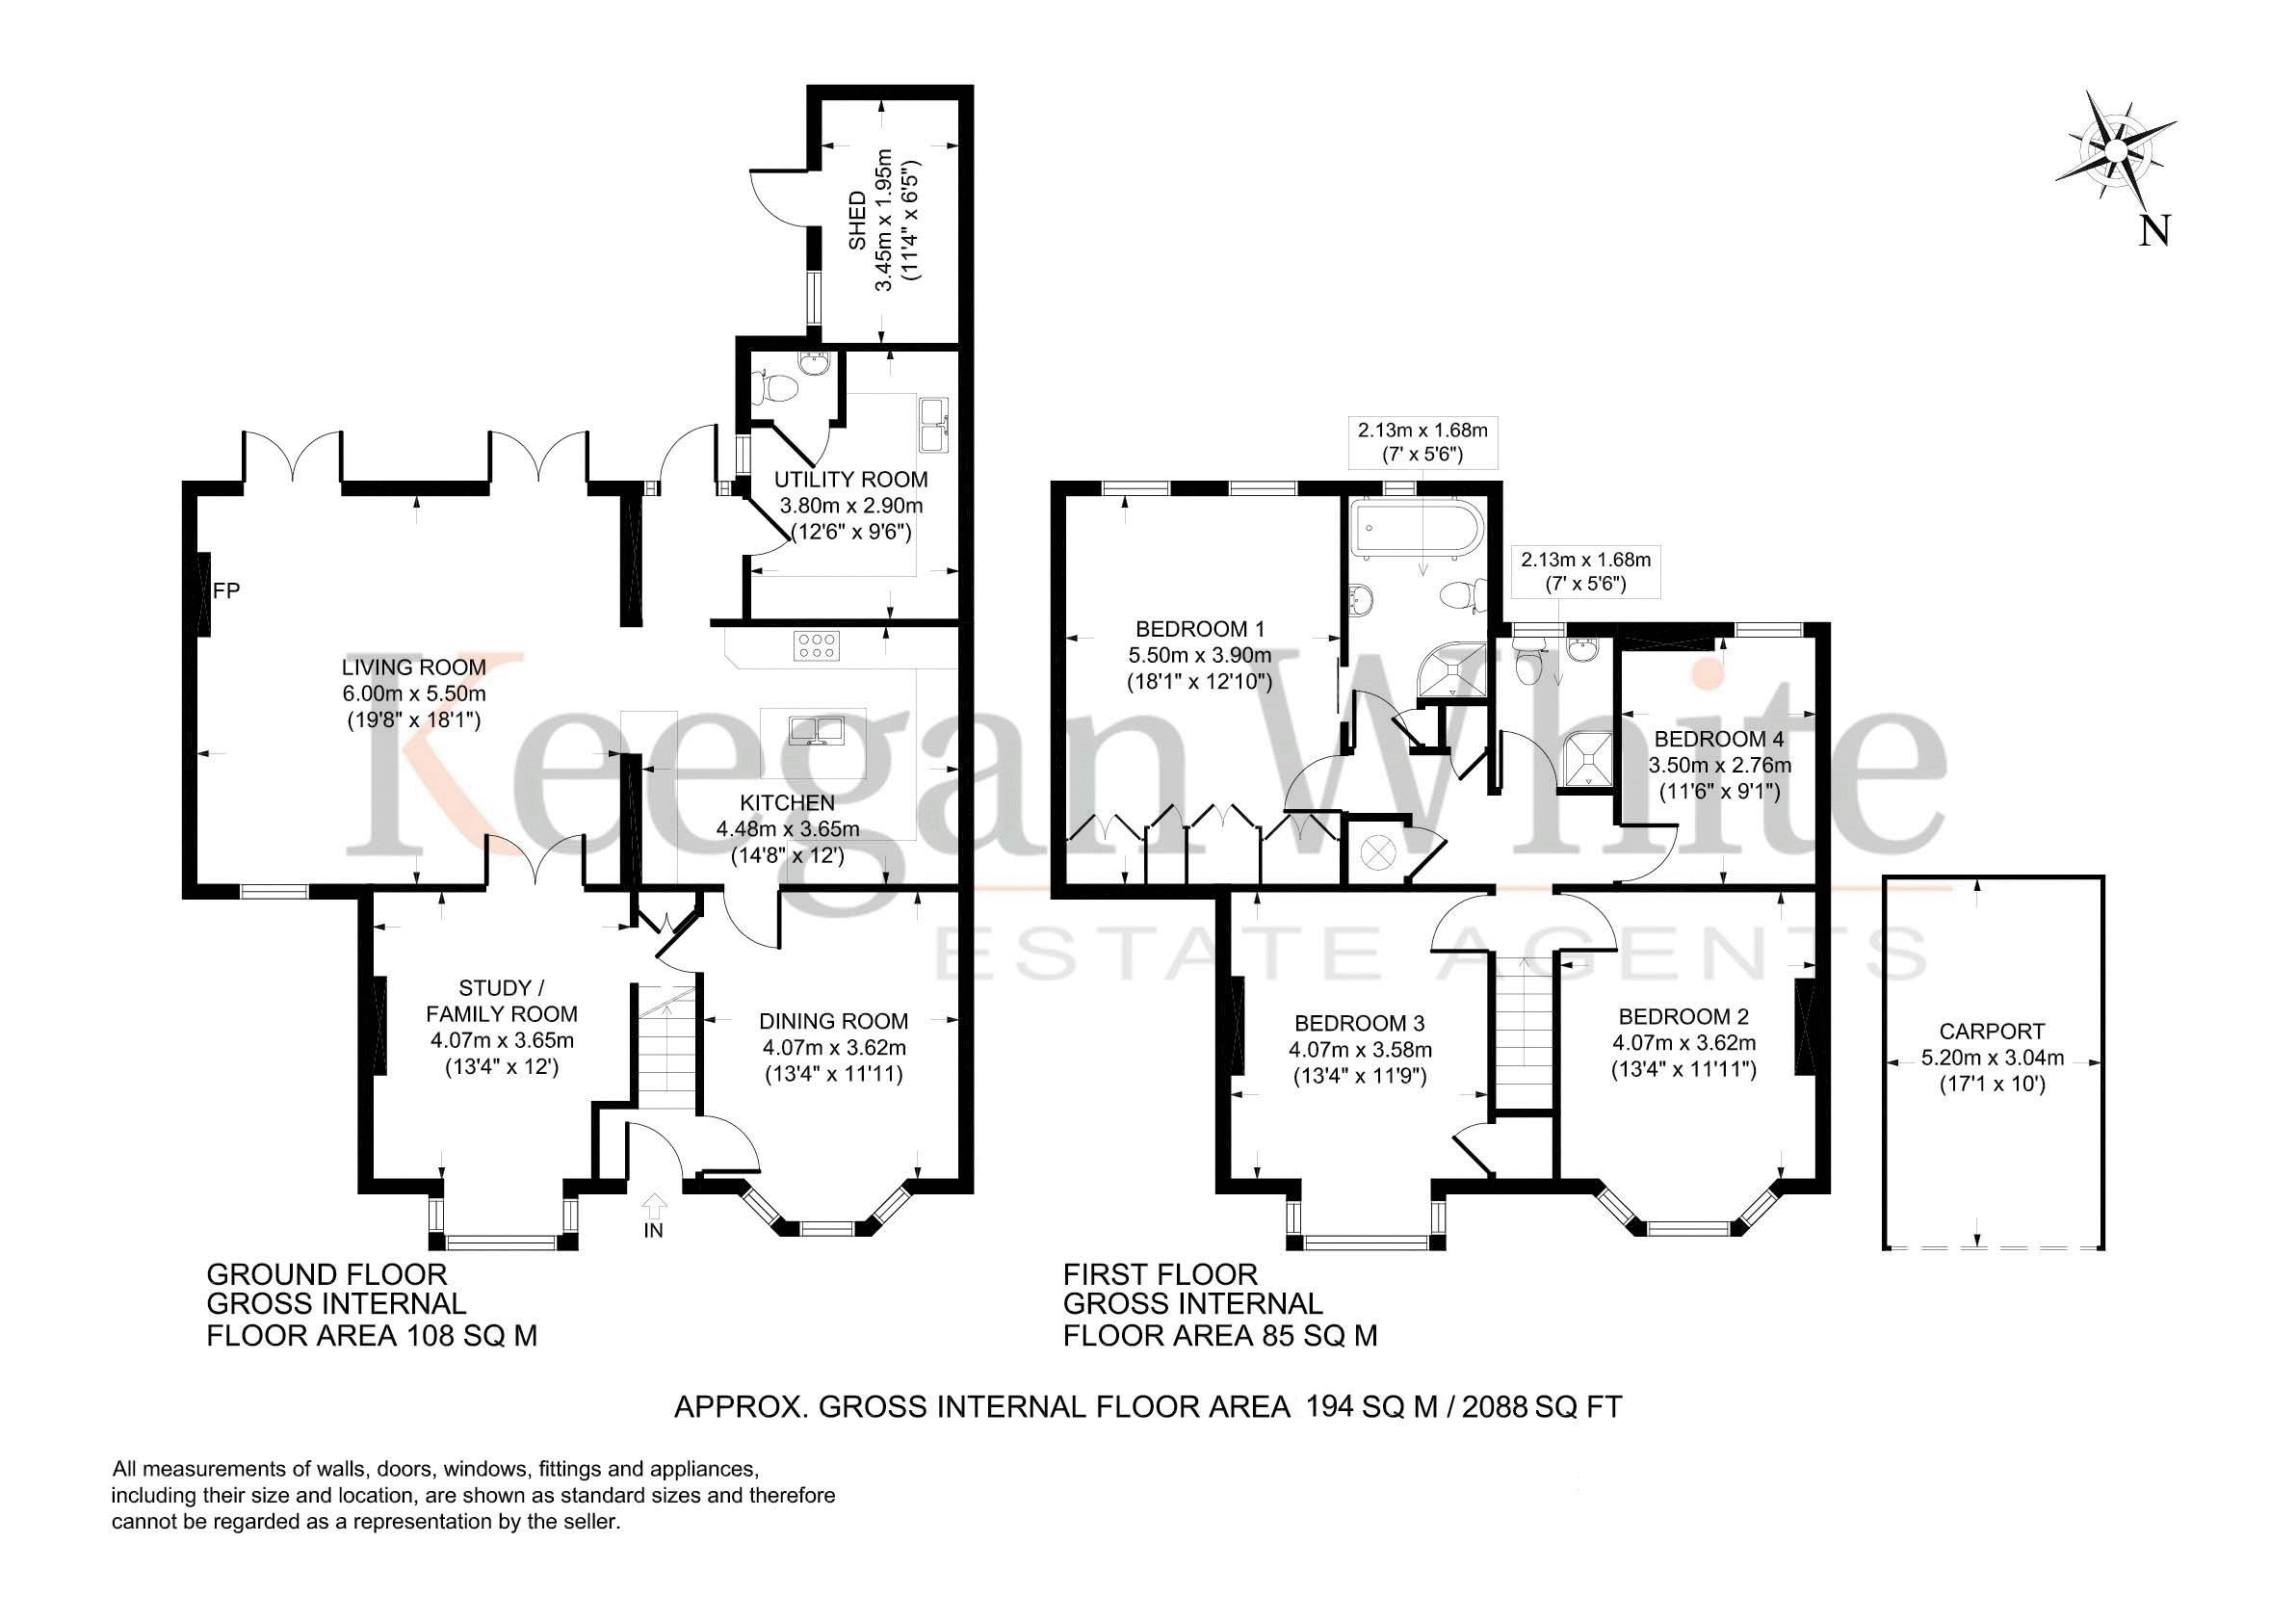 Keegan White - Floorplan - 141 Heath End Road